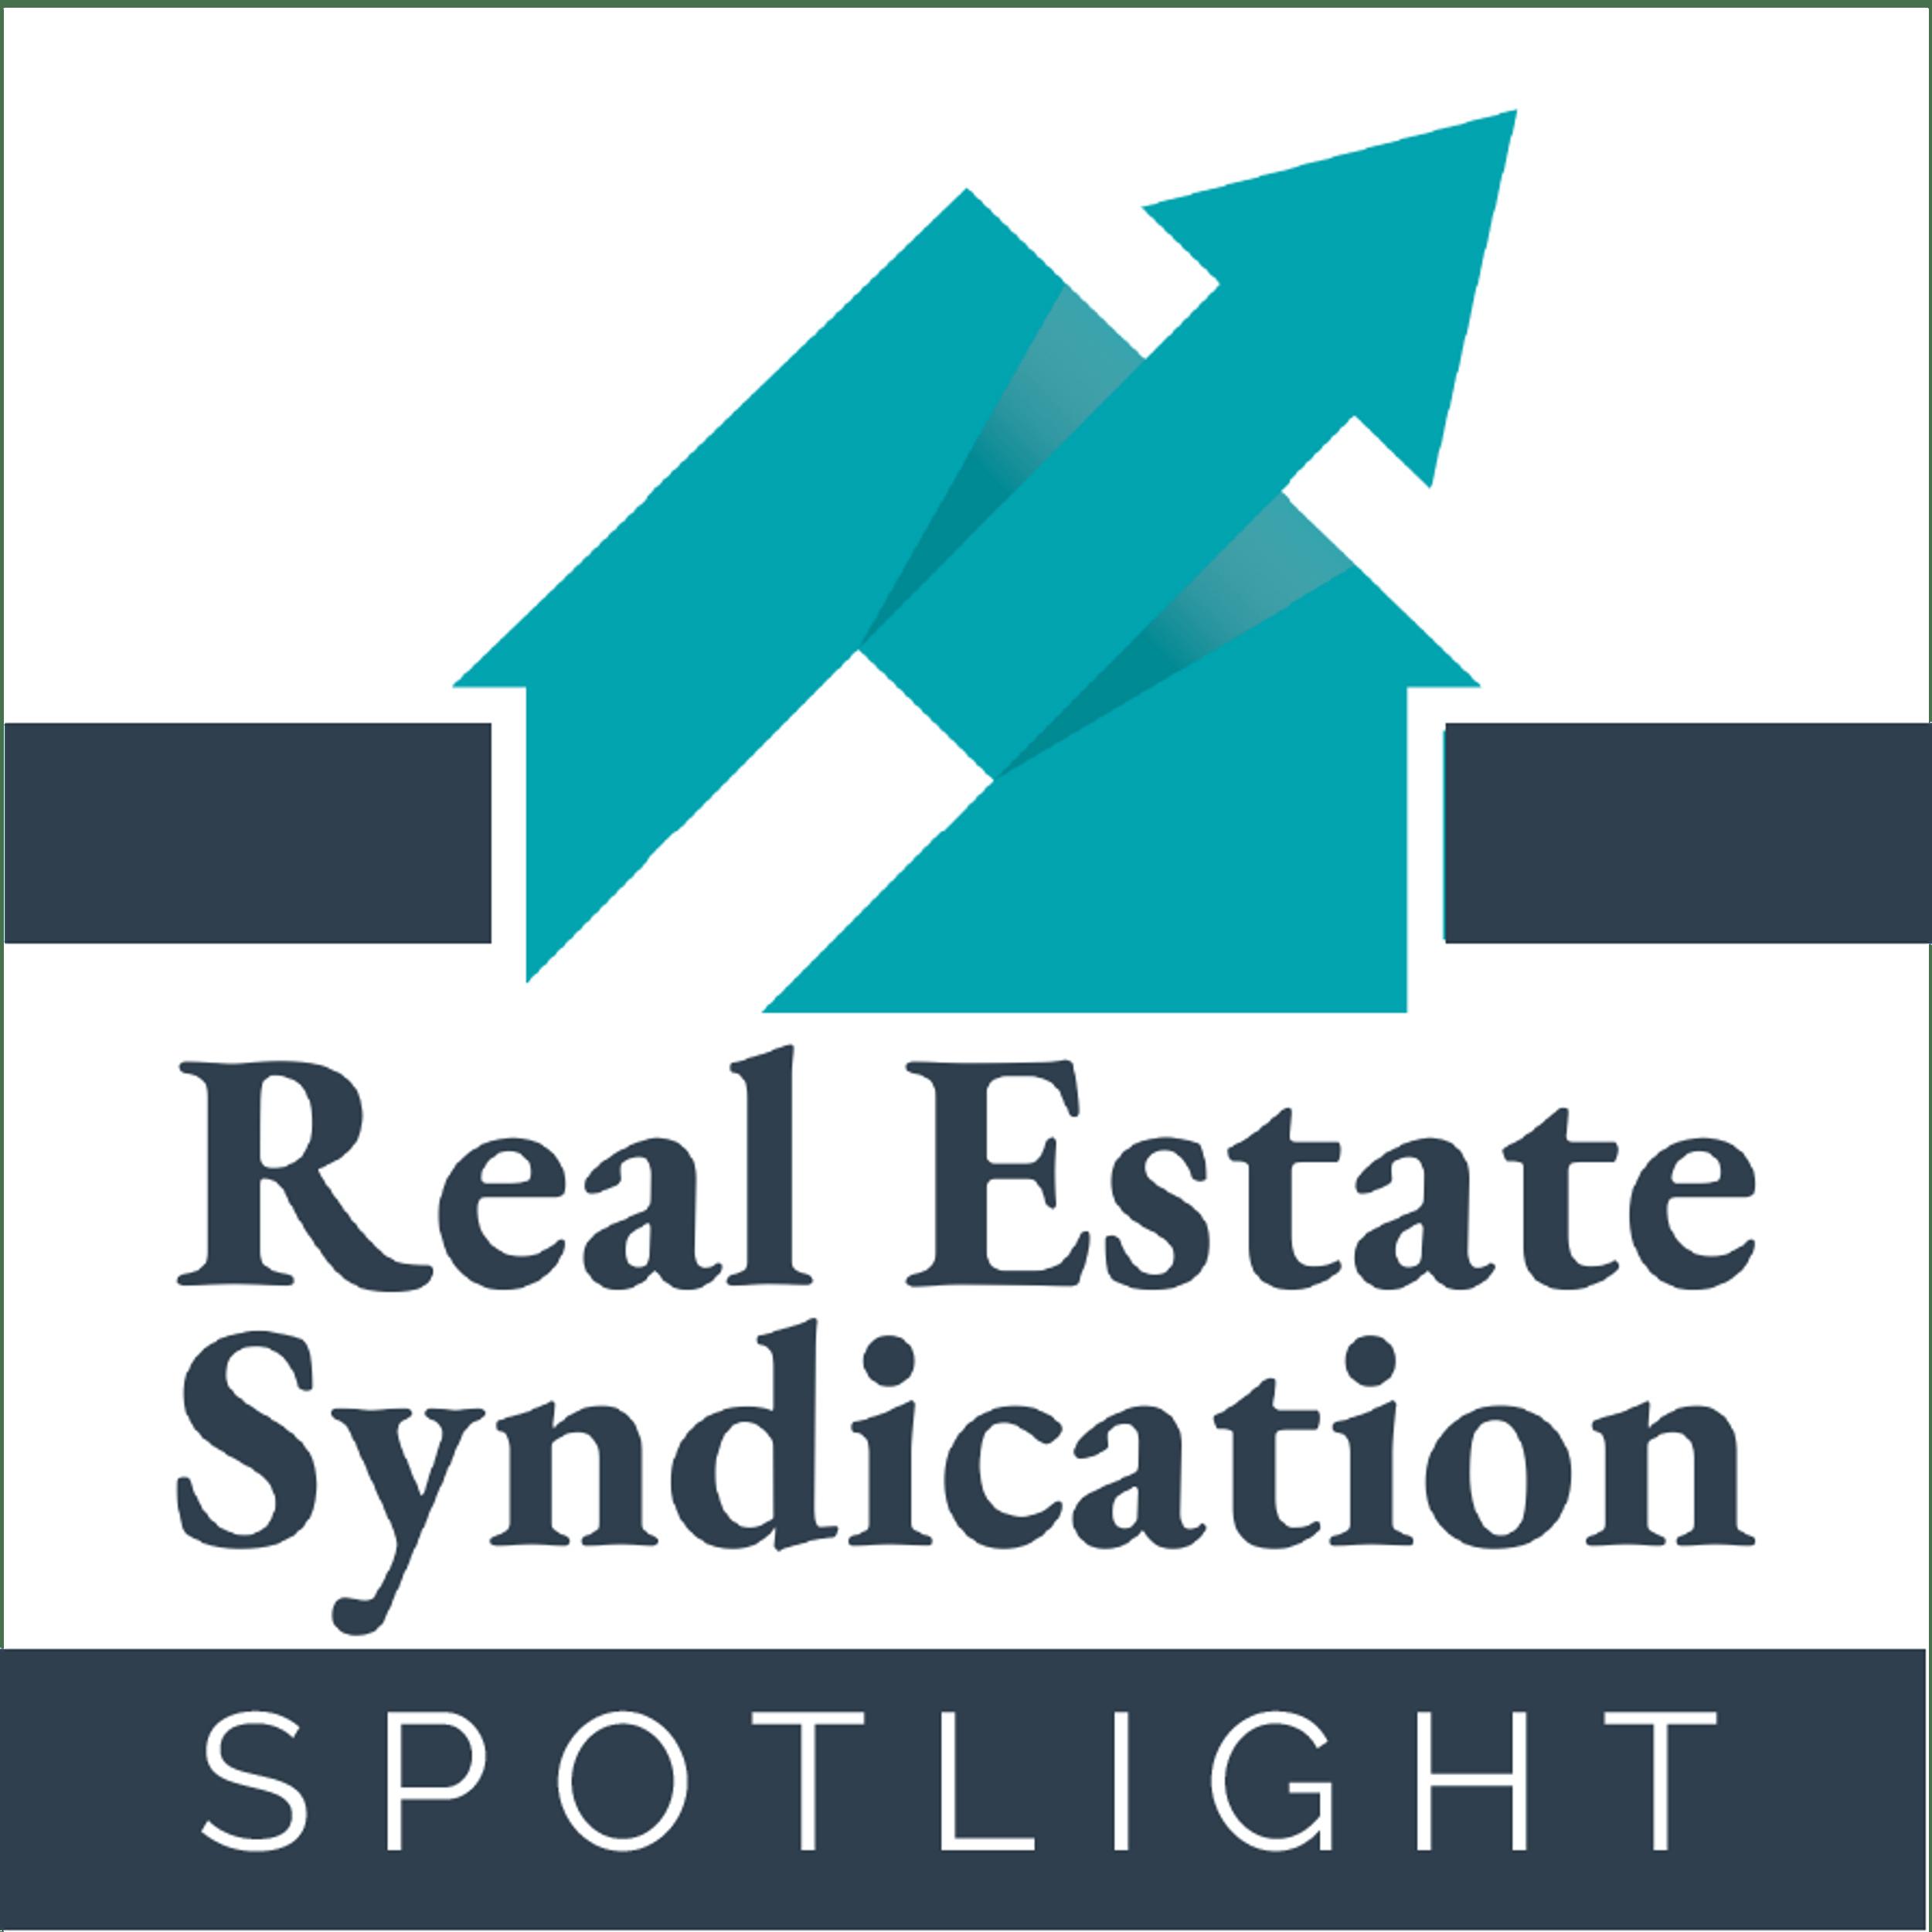 Artwork for podcast Real Estate Syndication Spotlight